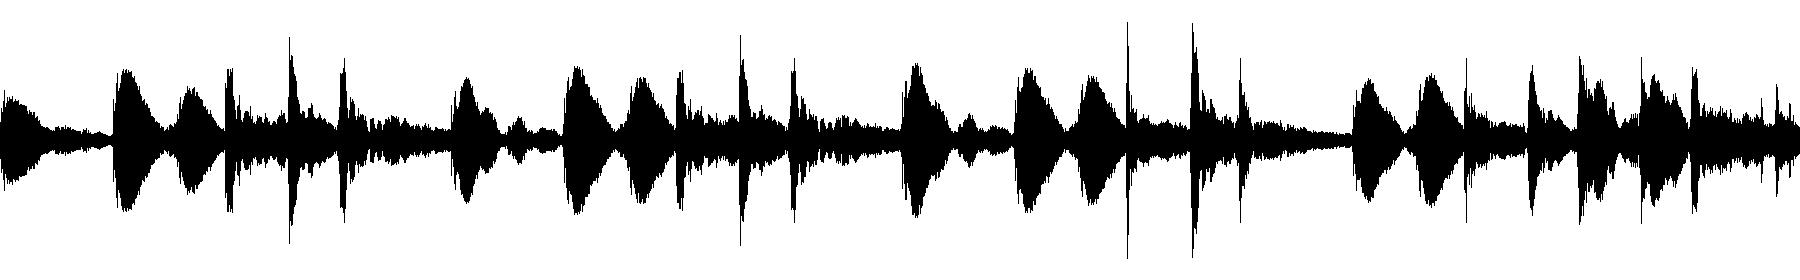 g abs05 097